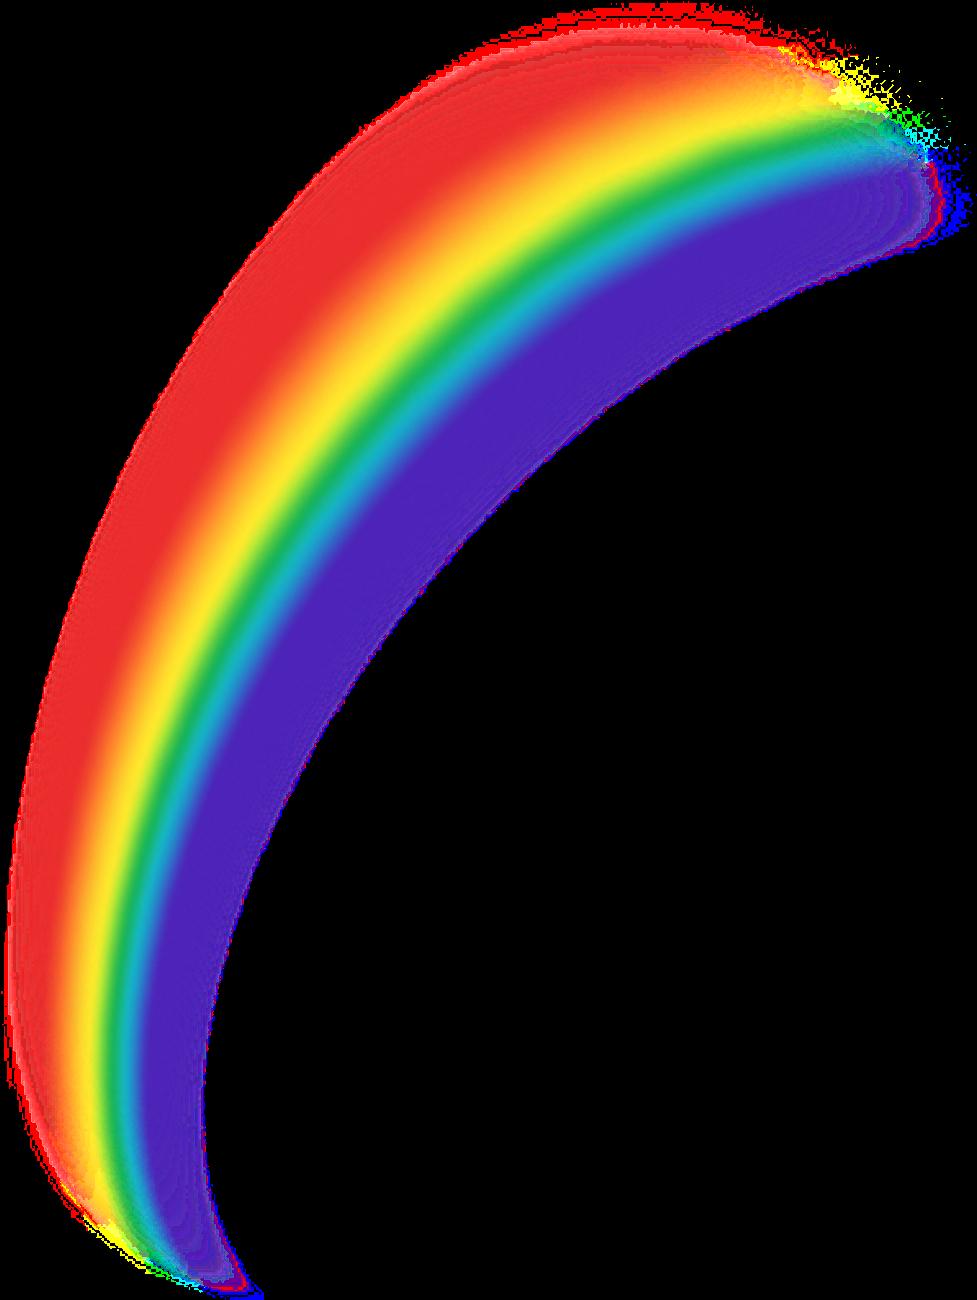 Rainbow Png Image Clip Art Free.